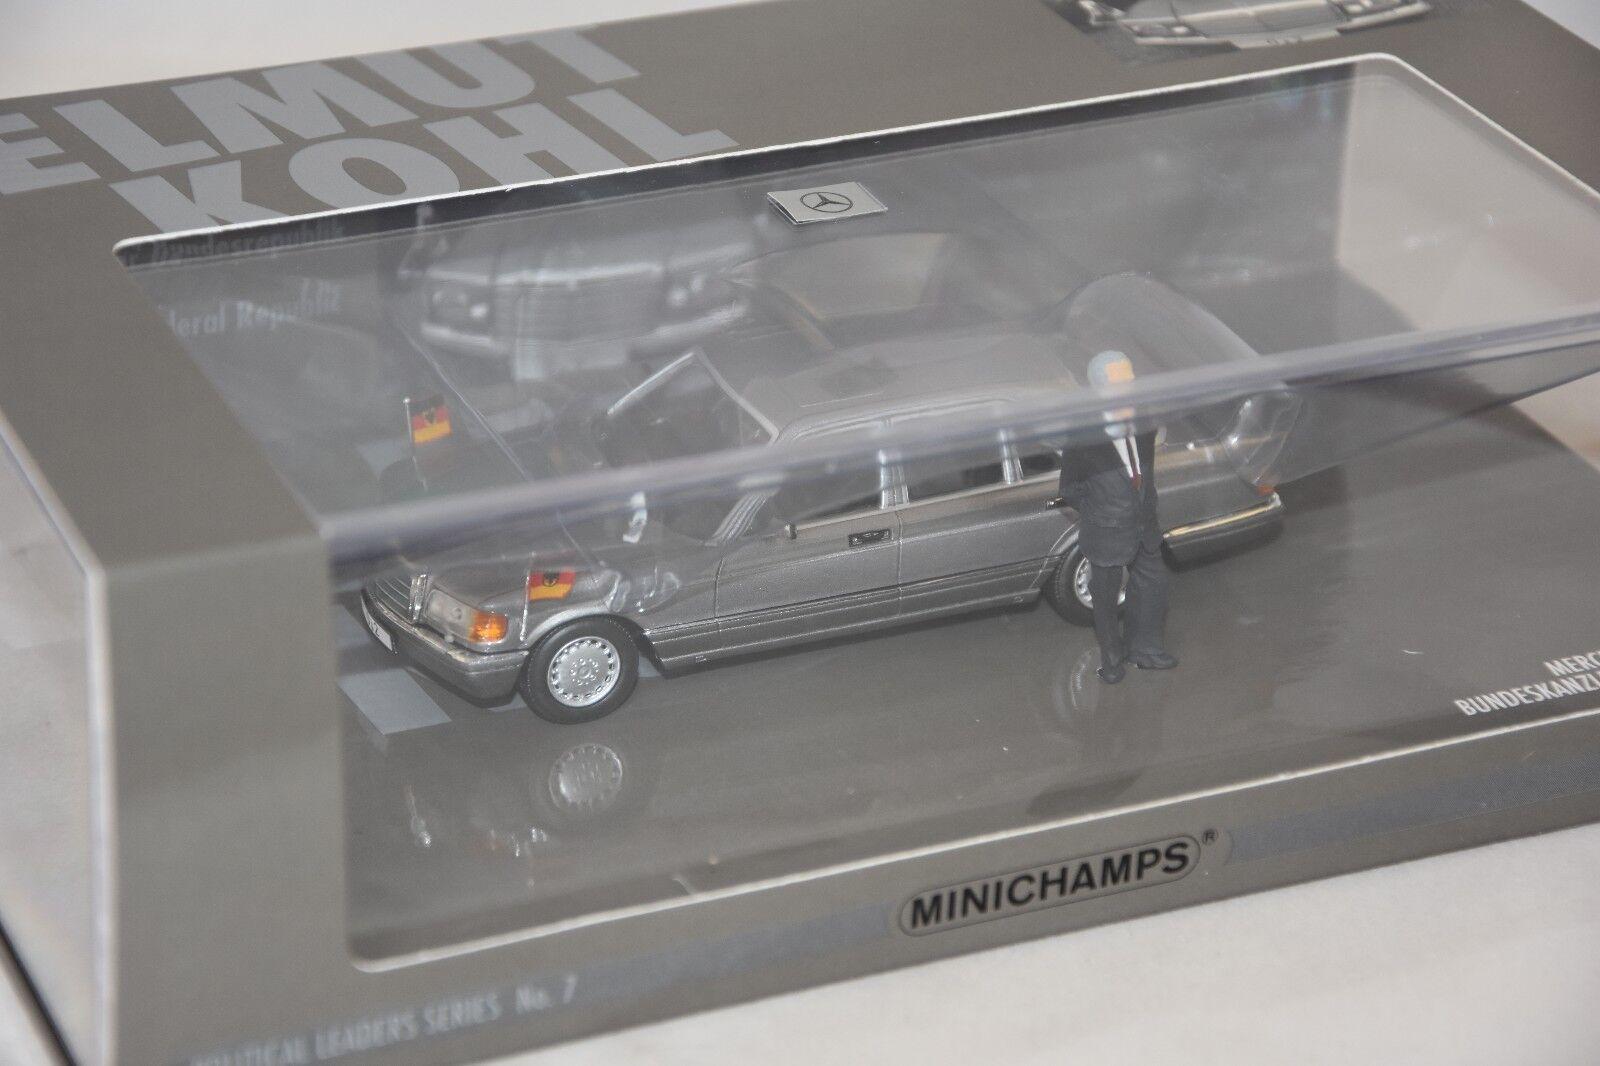 MINICHAMPS 436039300 - MERCEDES BENZ 500 SEL (W126) - 1989 - HELMUT KOHL  1 43